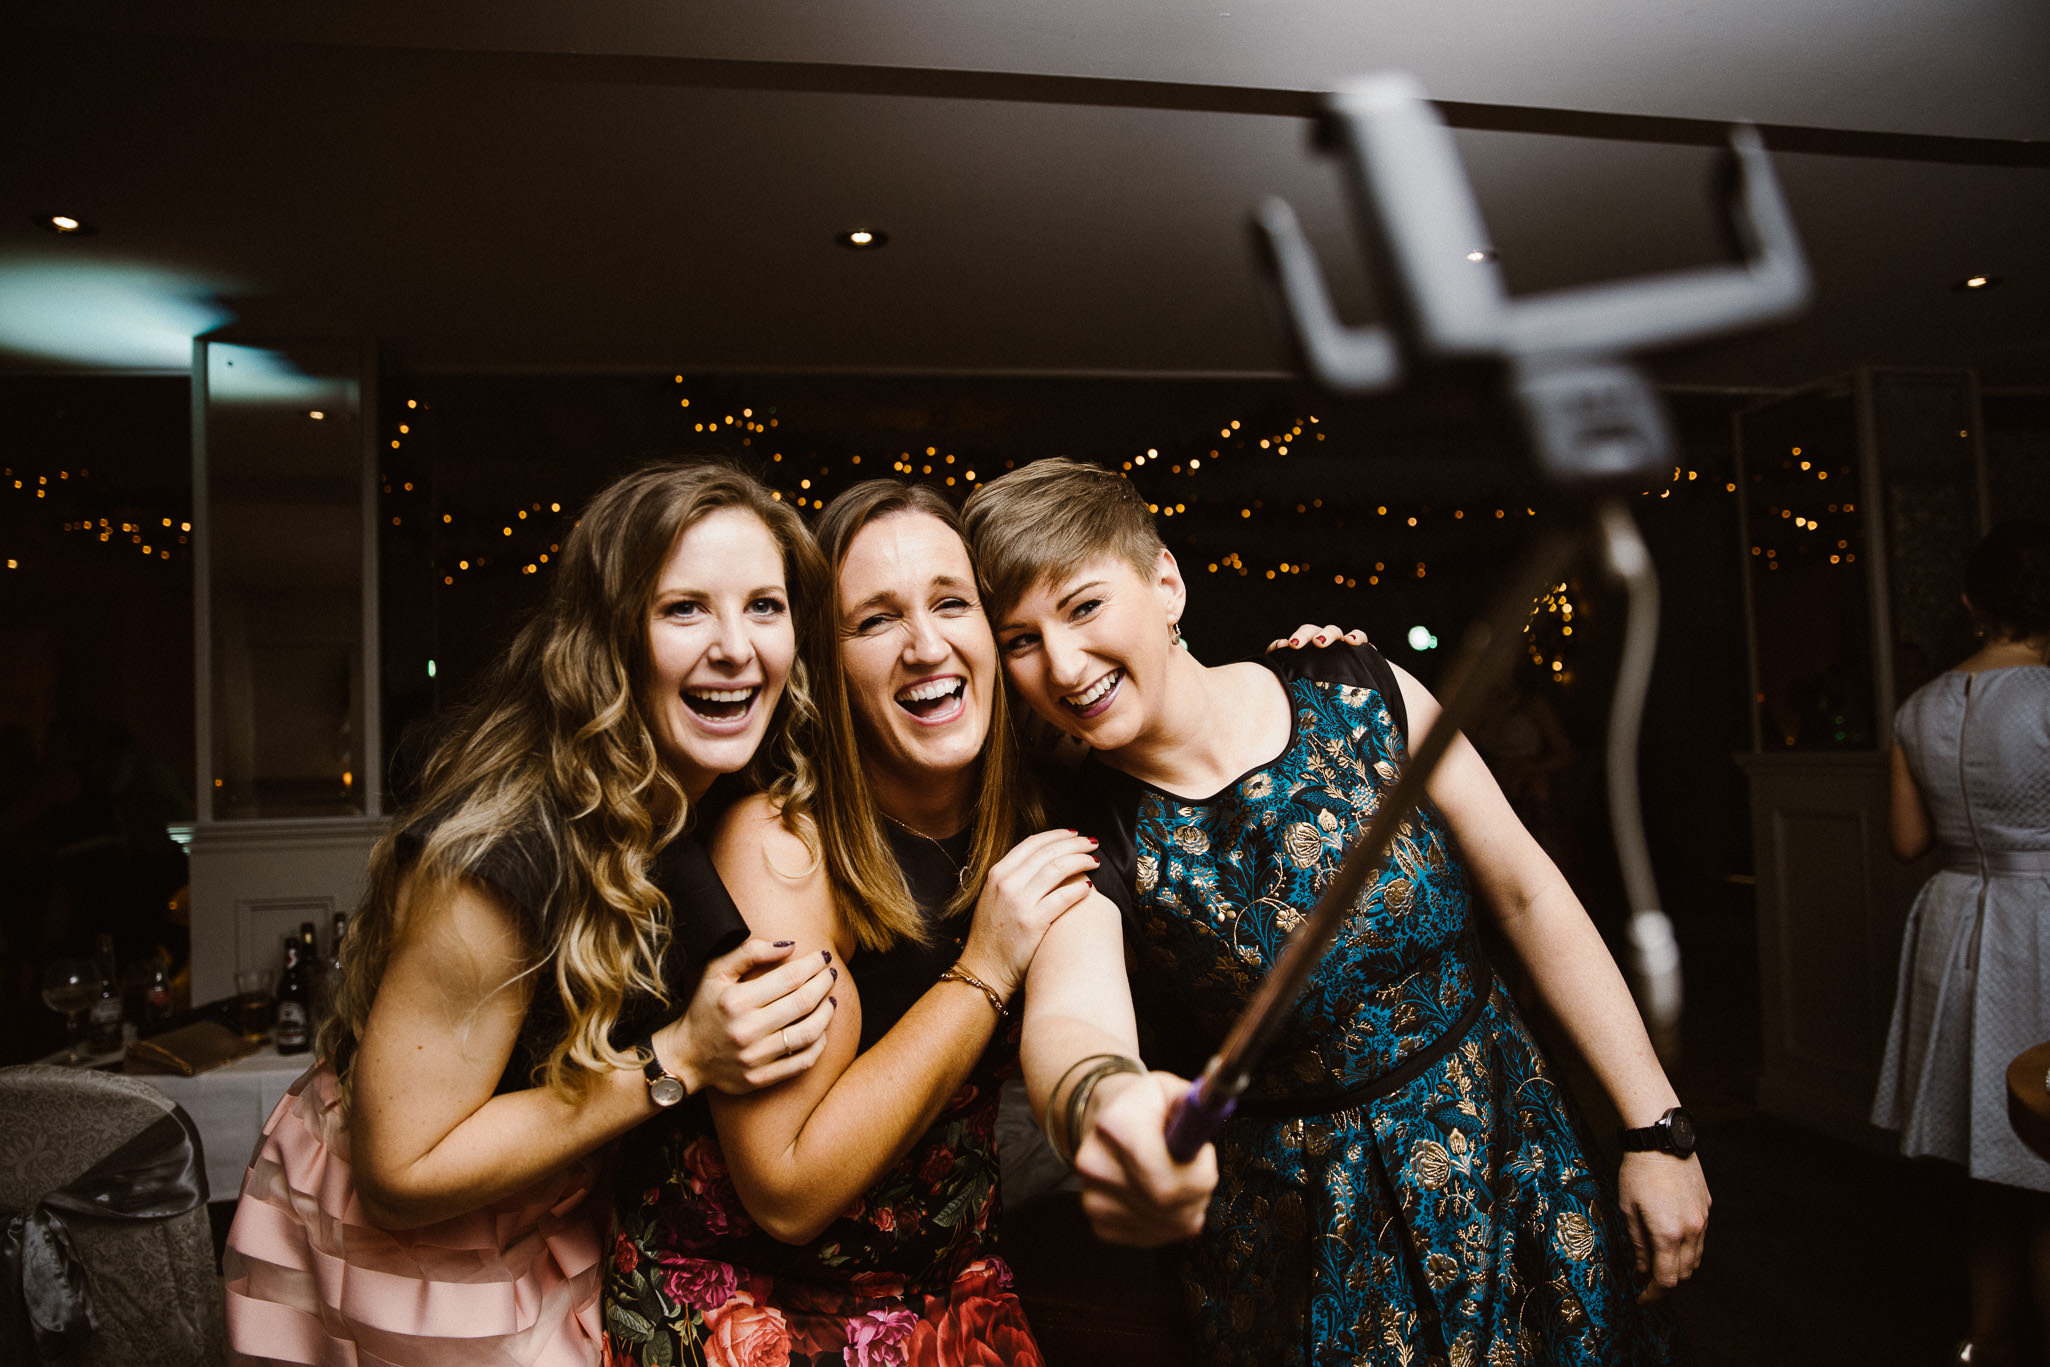 clairebyrnephotography-wedding-night-sparklers-new-years-eve-denyce-leonard-27.jpg